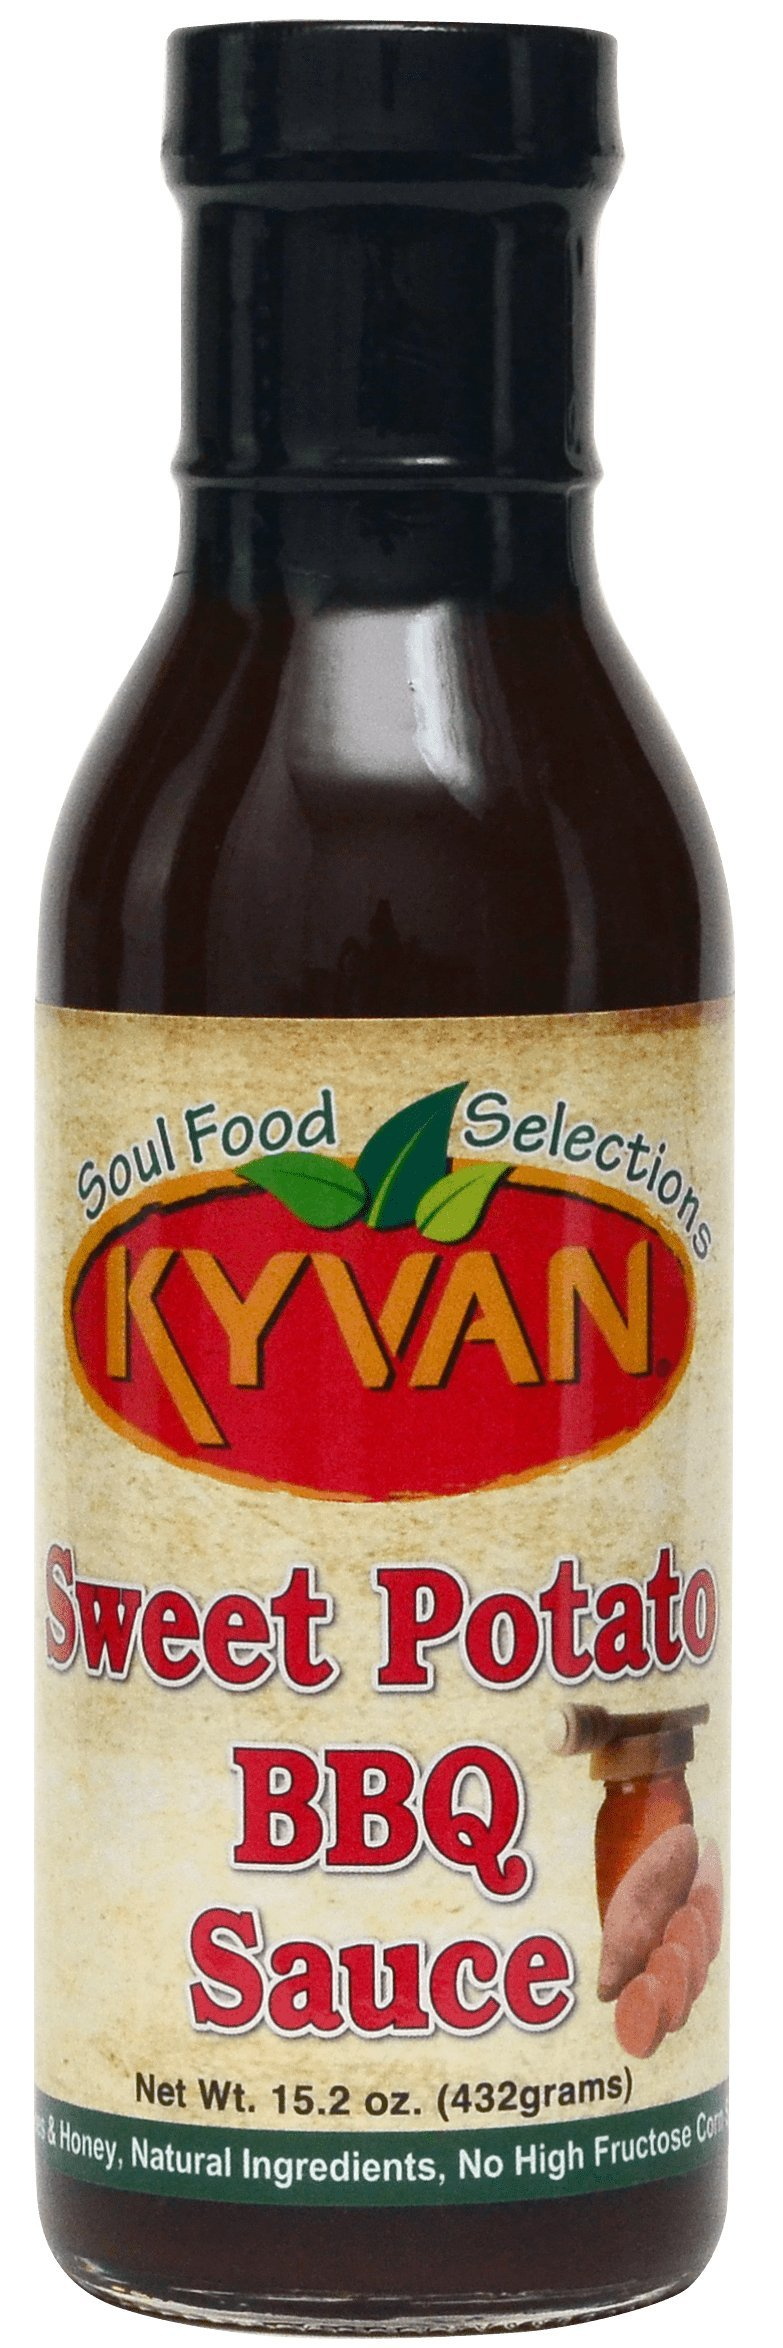 KYVAN Sweet Potato BBQ Sauce - 2 Pack by KYVAN